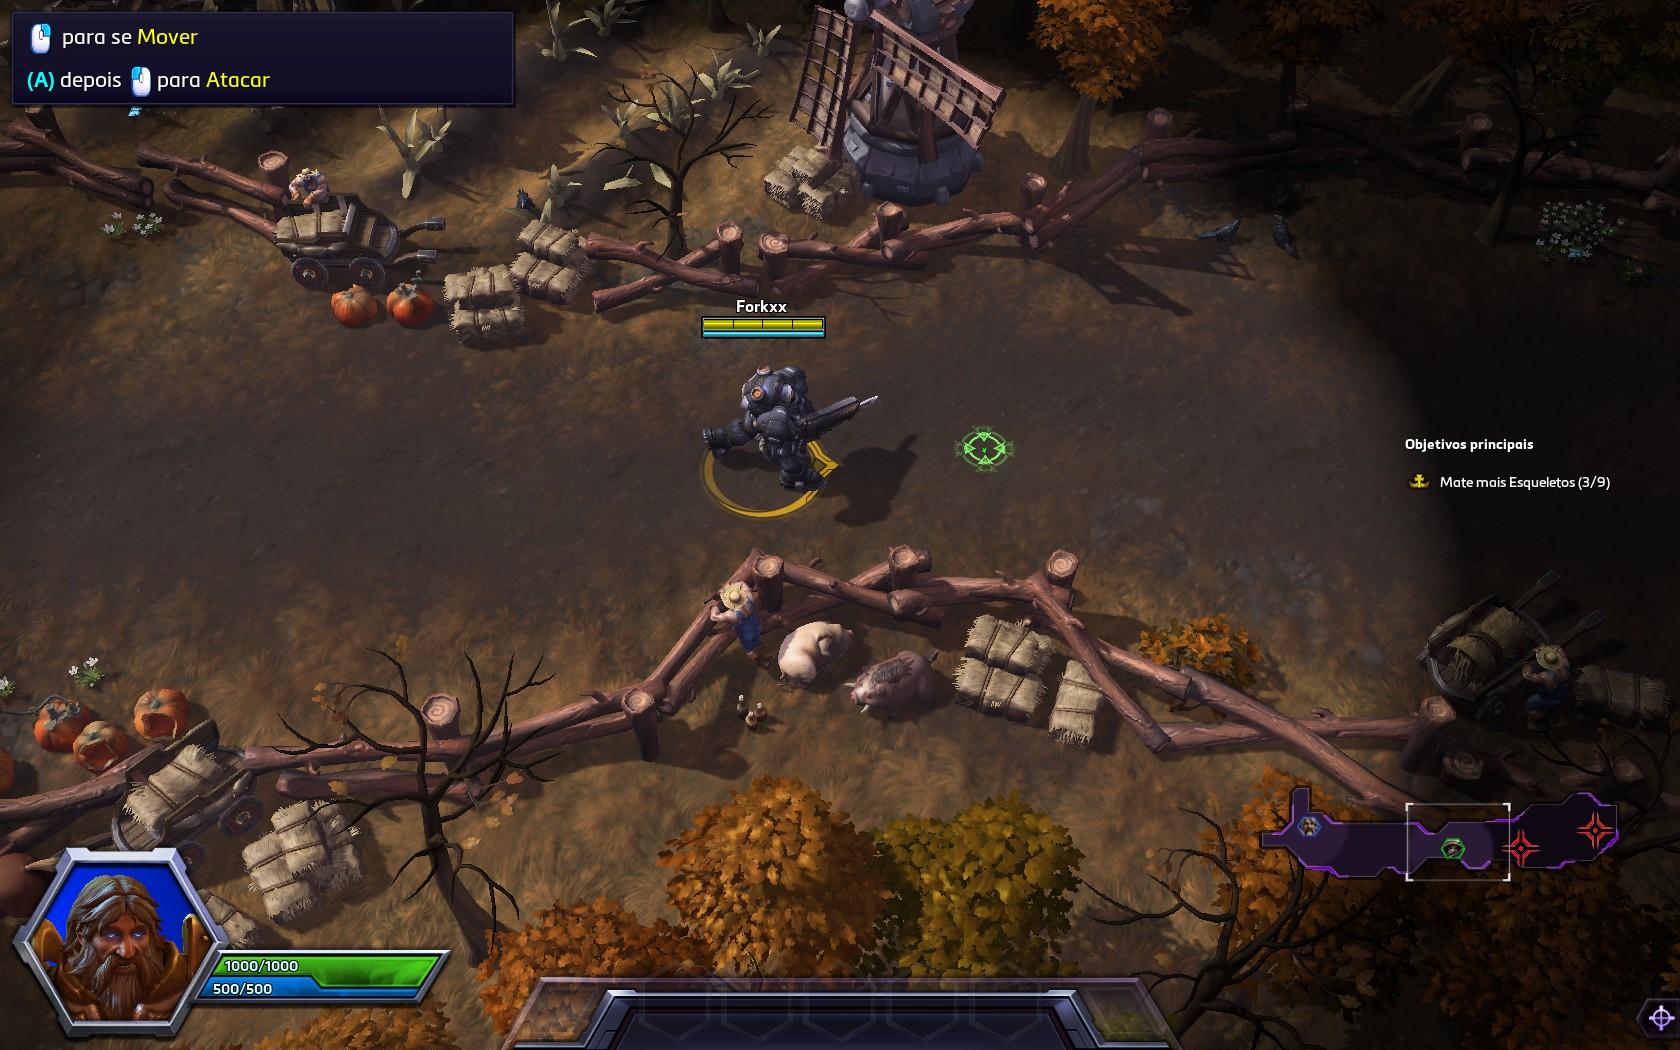 Heroes of the Storm - Imagem 1 do software